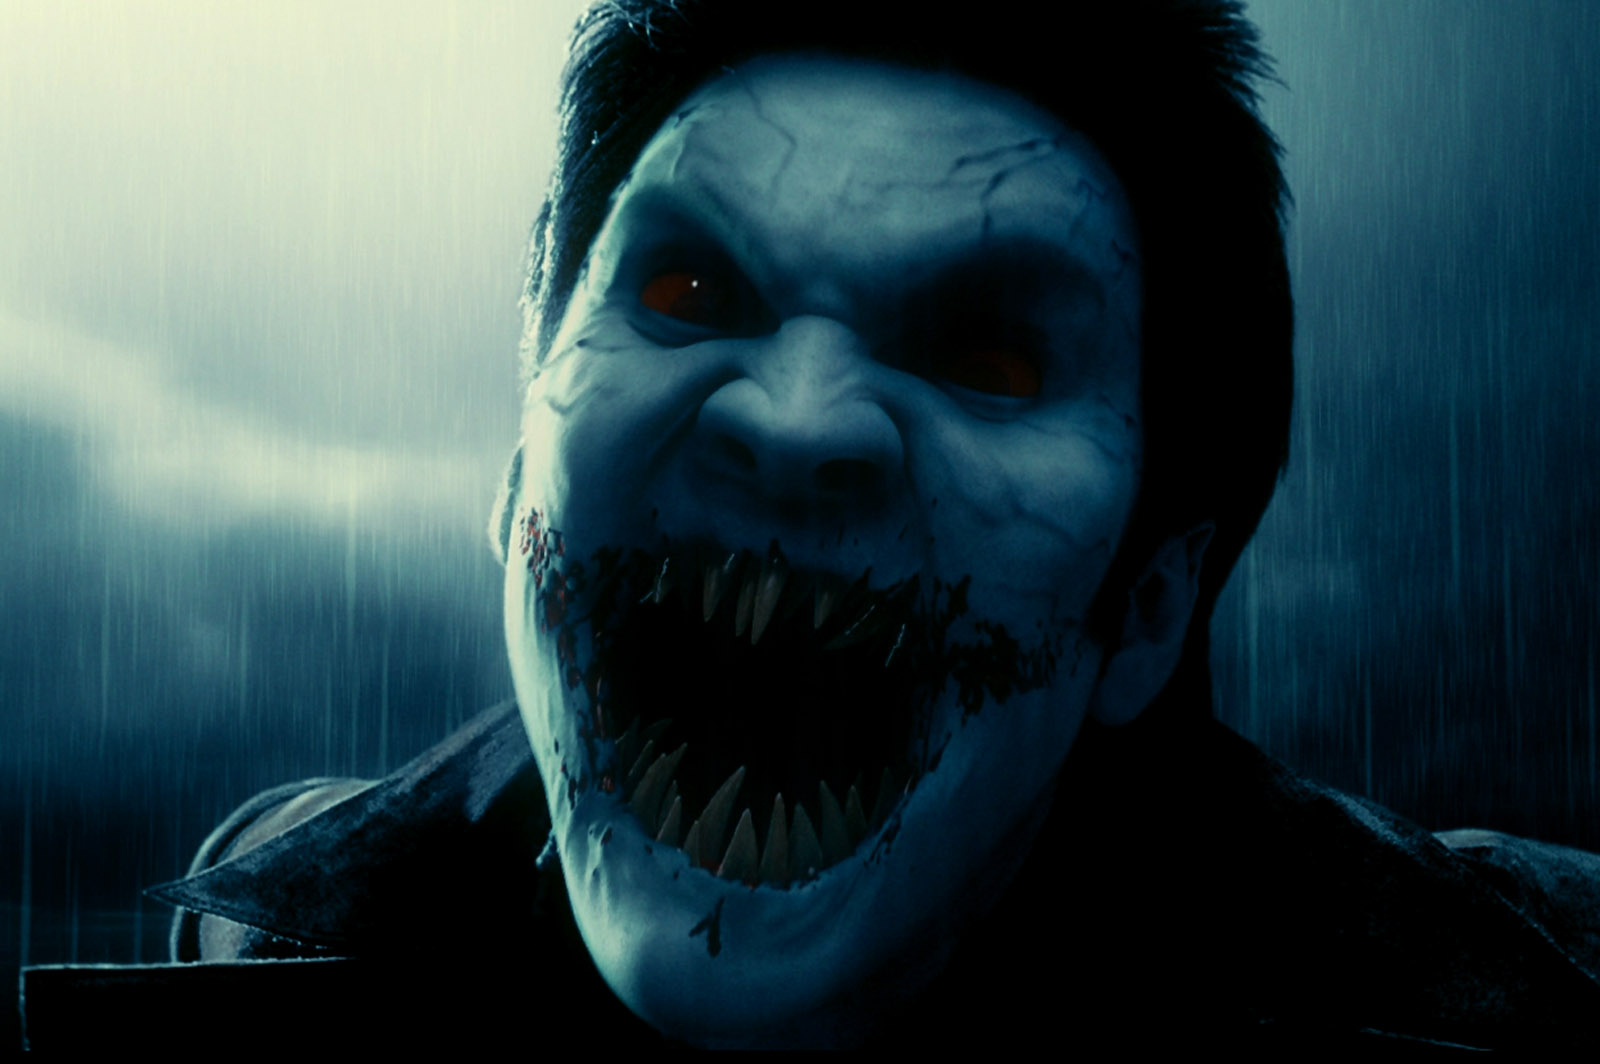 Blackheart | Ghost Rider Movies Wiki | FANDOM powered by Wikia